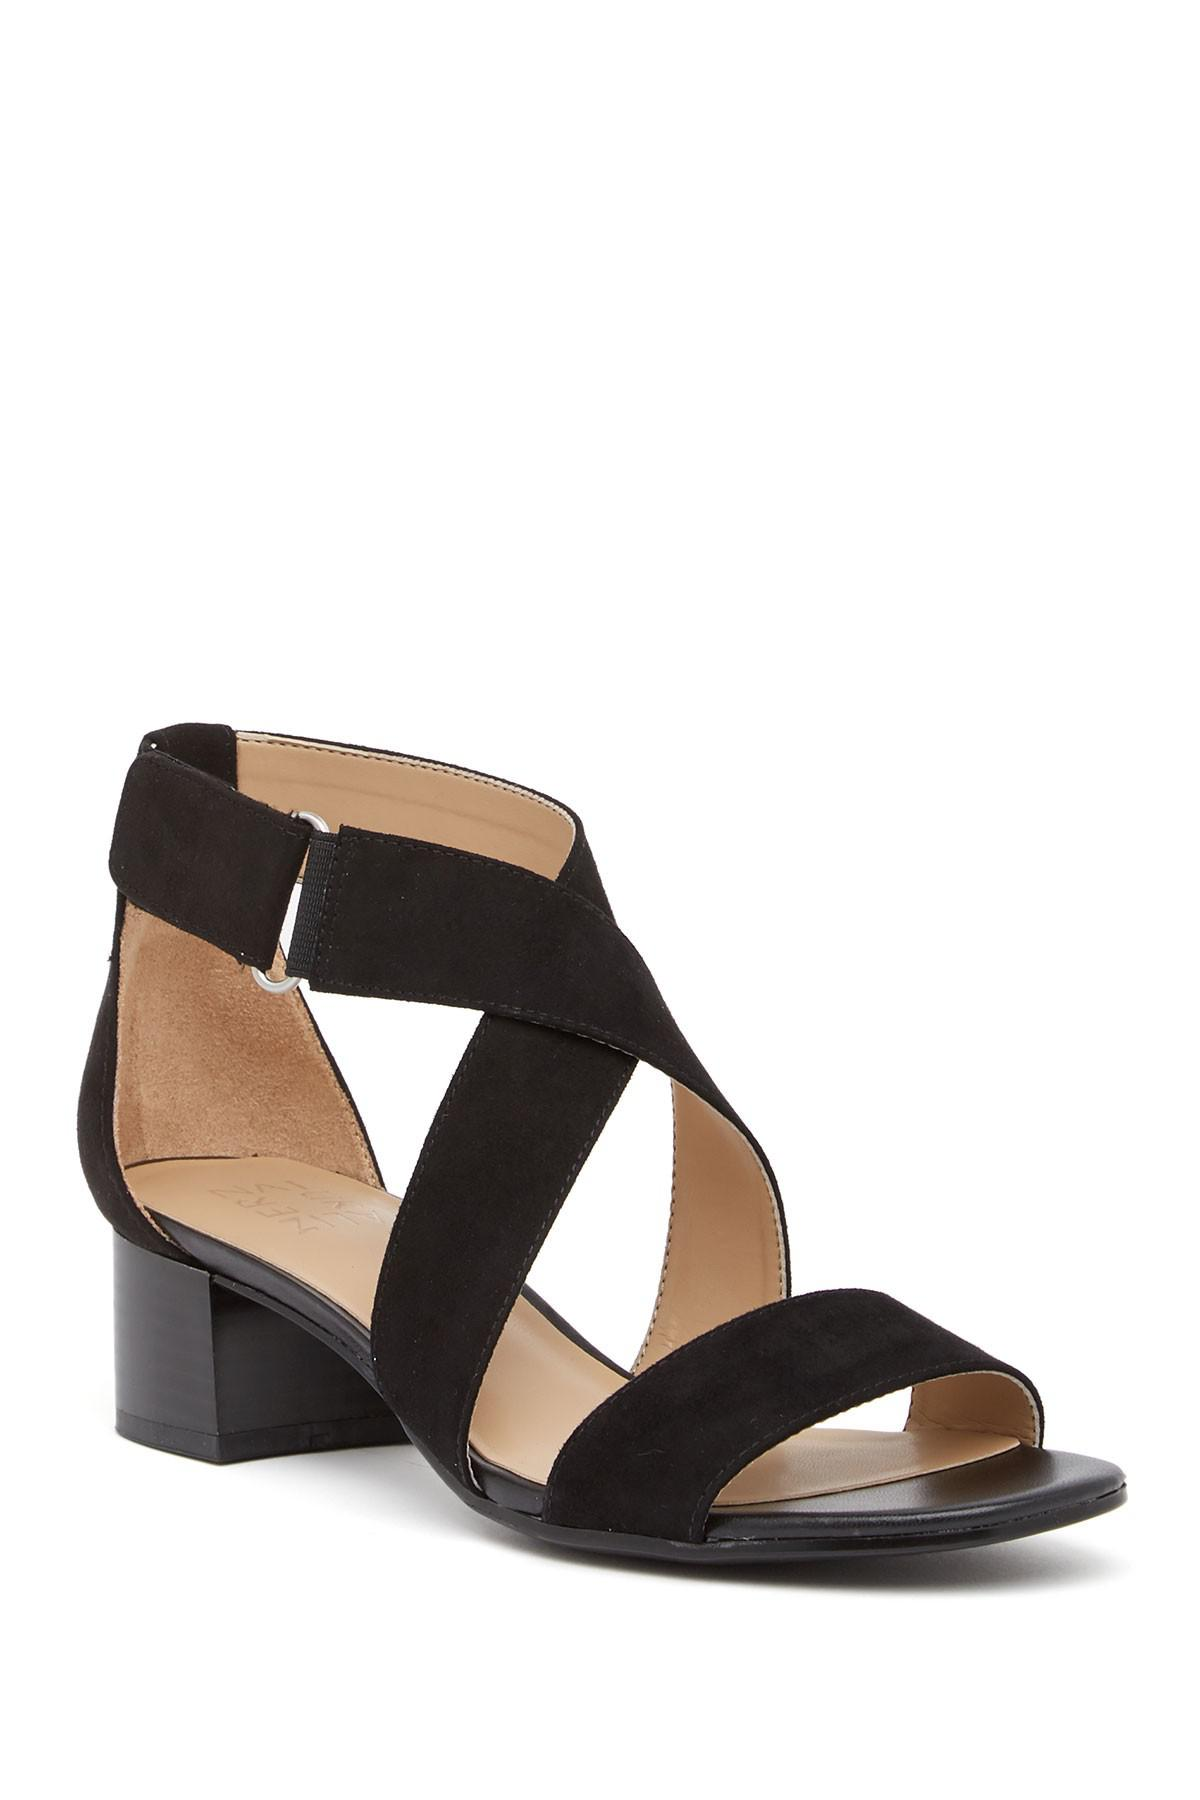 40658e11ece6 Naturalizer. Women s Black Adele Block Heel Sandal - Wide Width Available